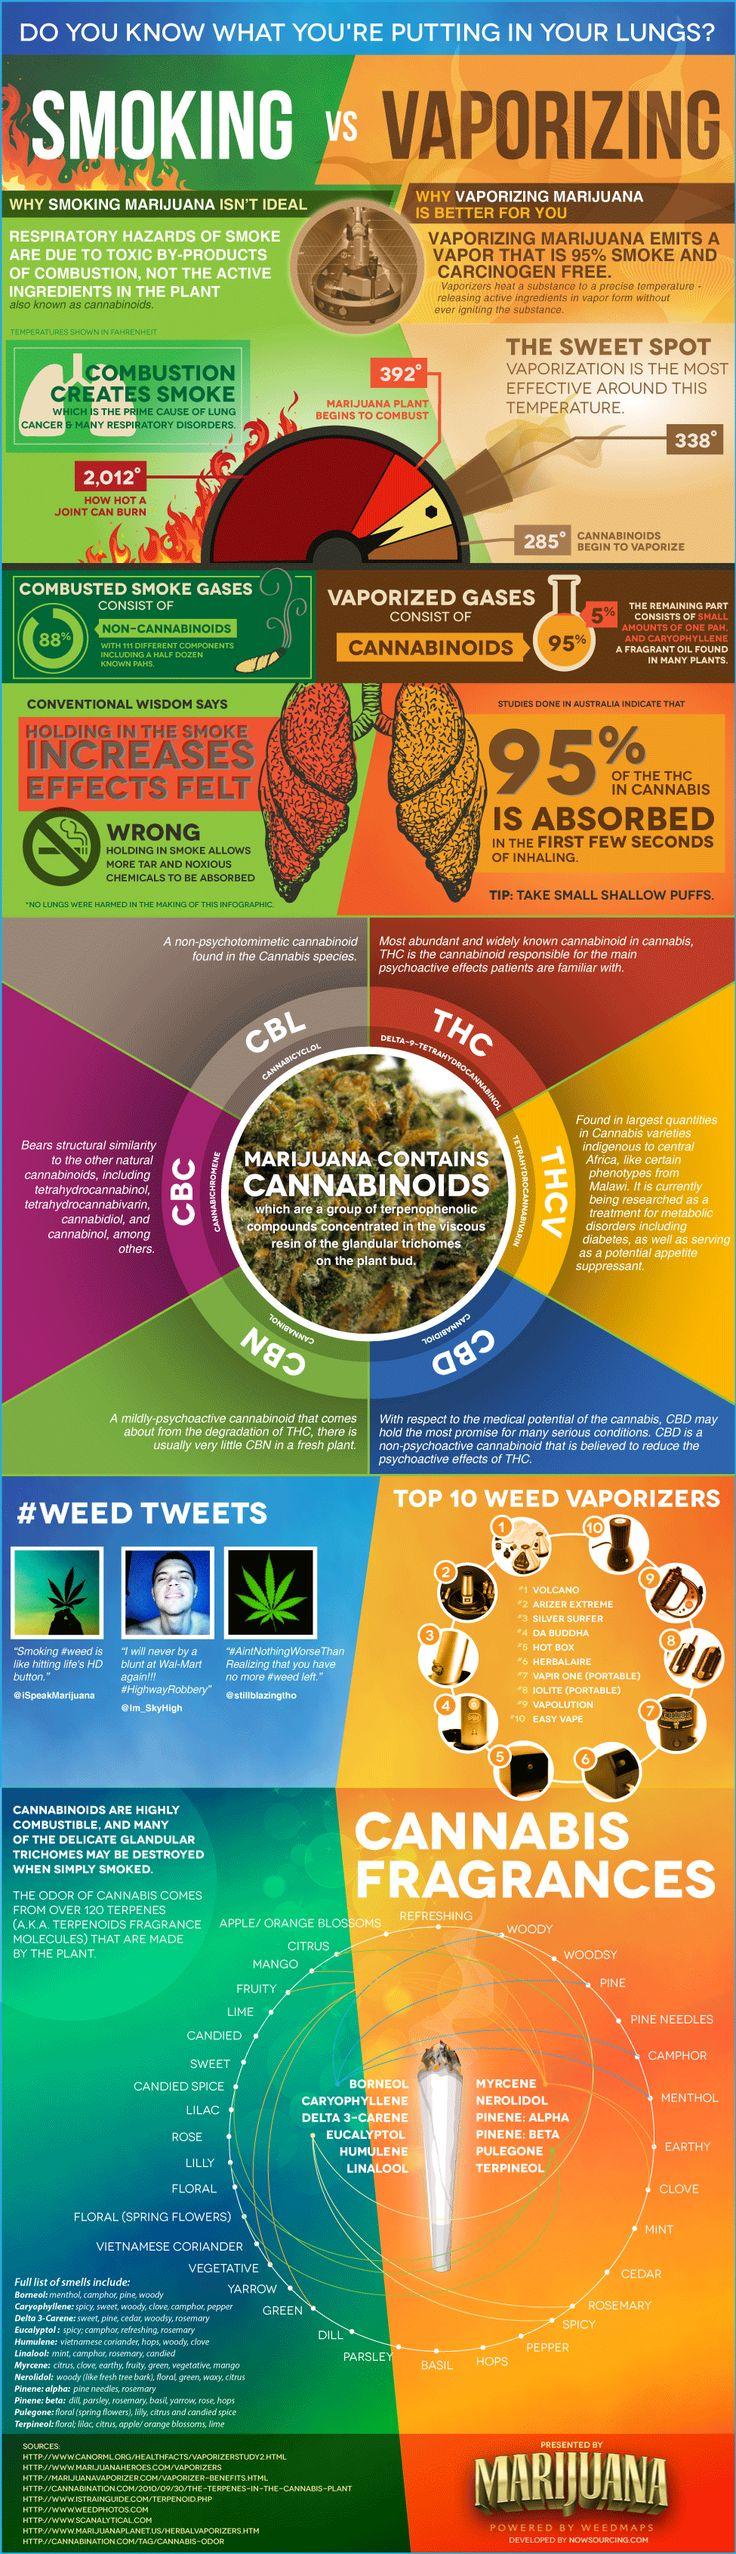 Smoking marijuana vs vaporizing marijuana infographic